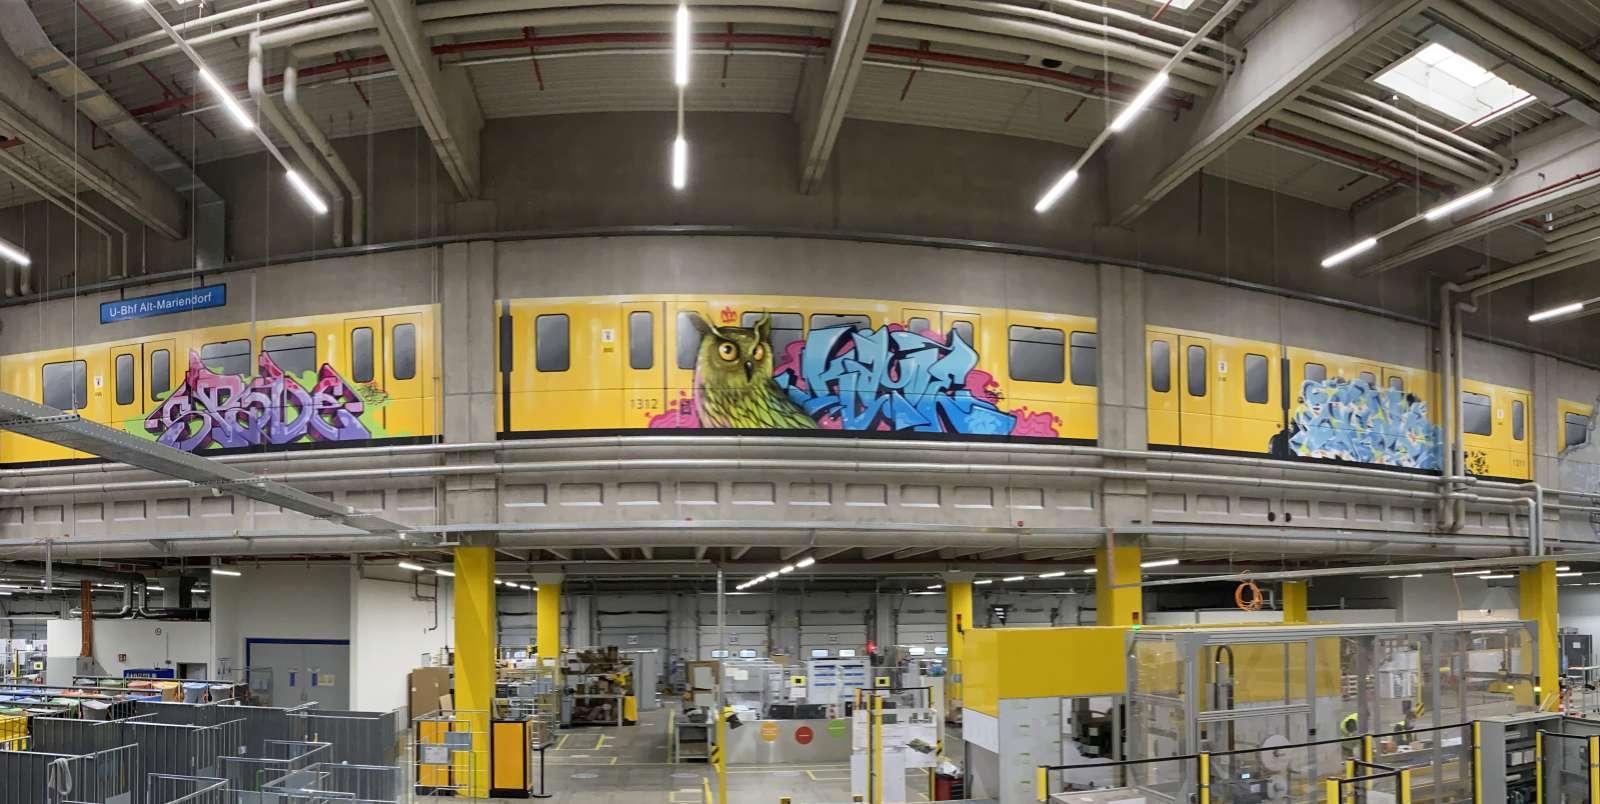 Amazon_berlin_2021_graffiti_tier_ubahn_innen_gelb_blau_graffiti_tags_logistik_02_artmos4_graffitiauftrag_graffitikuenstler